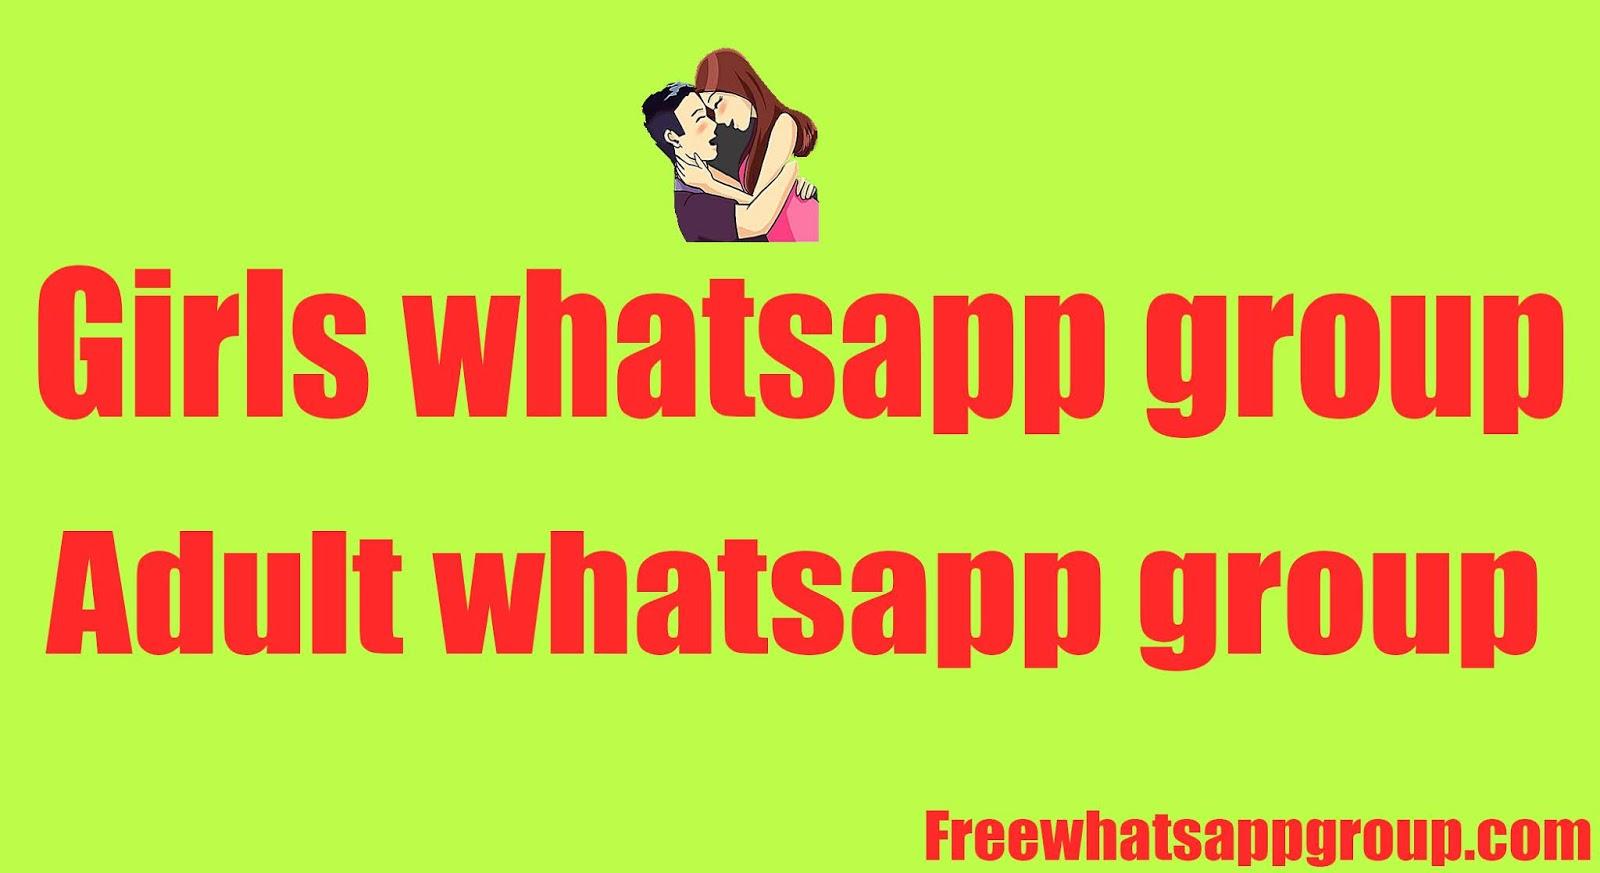 girls whatsapp group, adult whatsapp group, porn whatsapp group, sex whatsapp group,